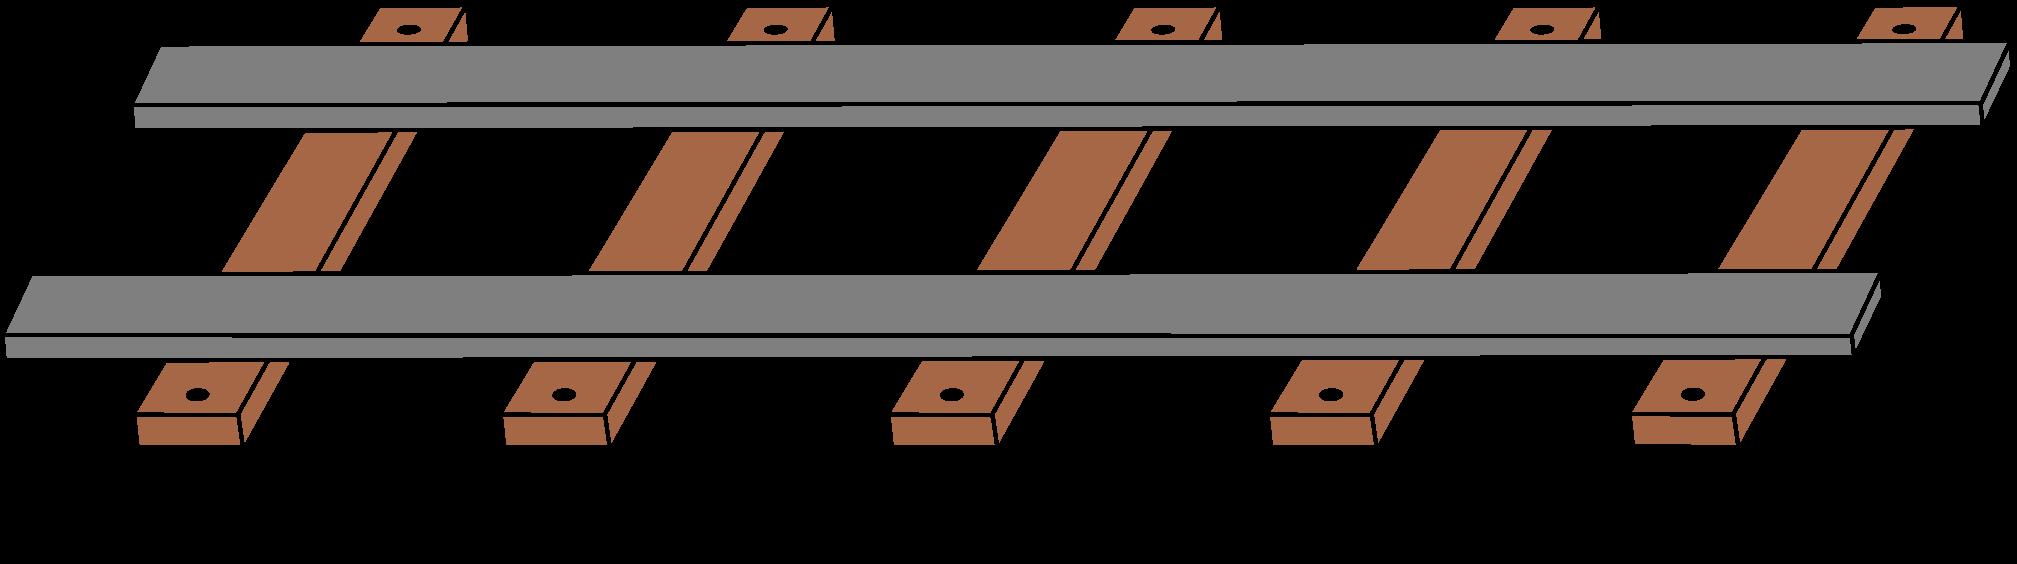 Image train tracks png. Track clipart rail track